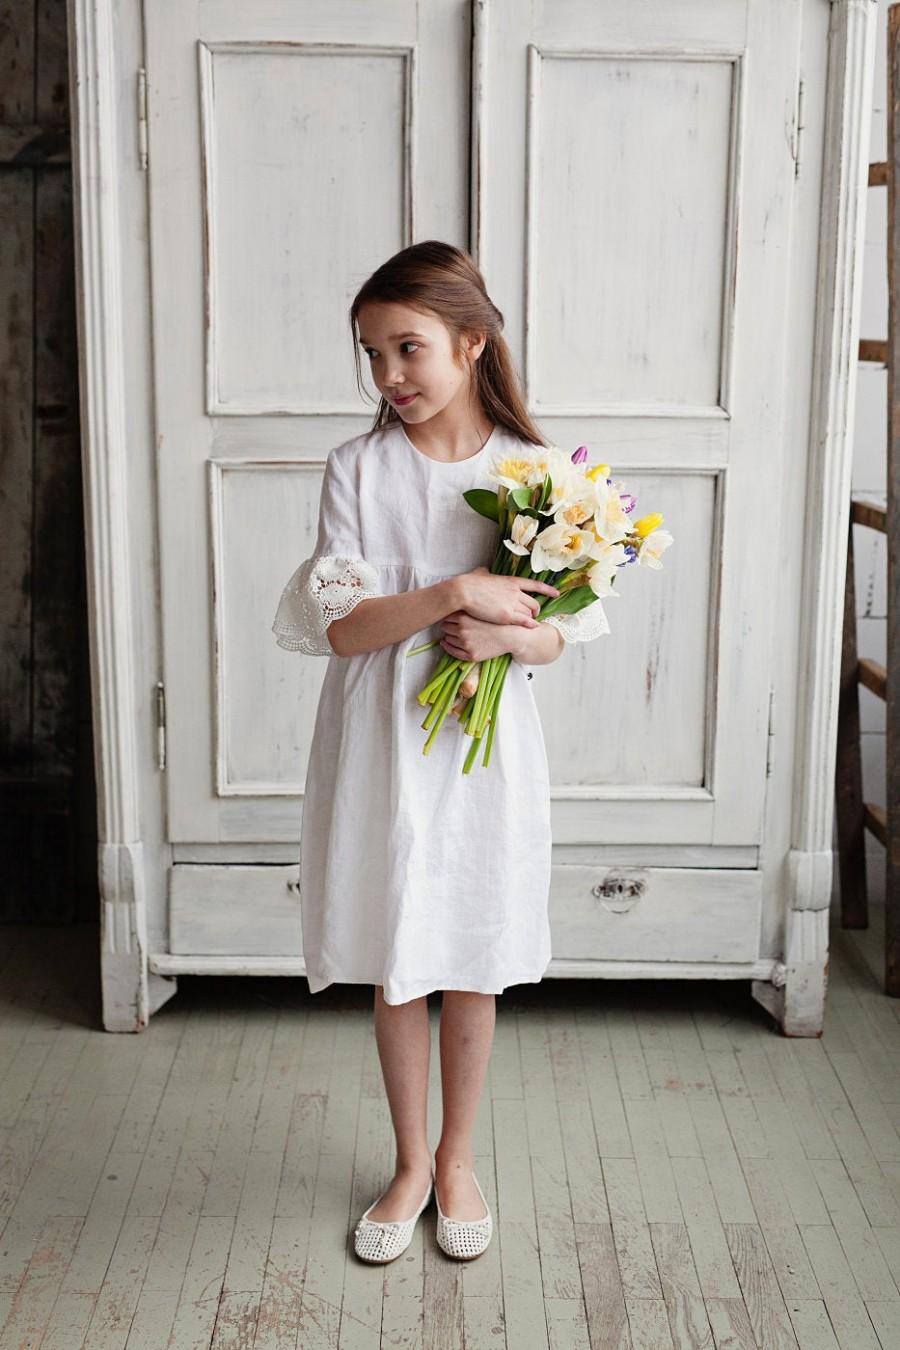 Hochzeit - White flower girl dress with bell sleeves, white summer dress, linen dress for girls, toddler wedding dress, washed linen girl dress